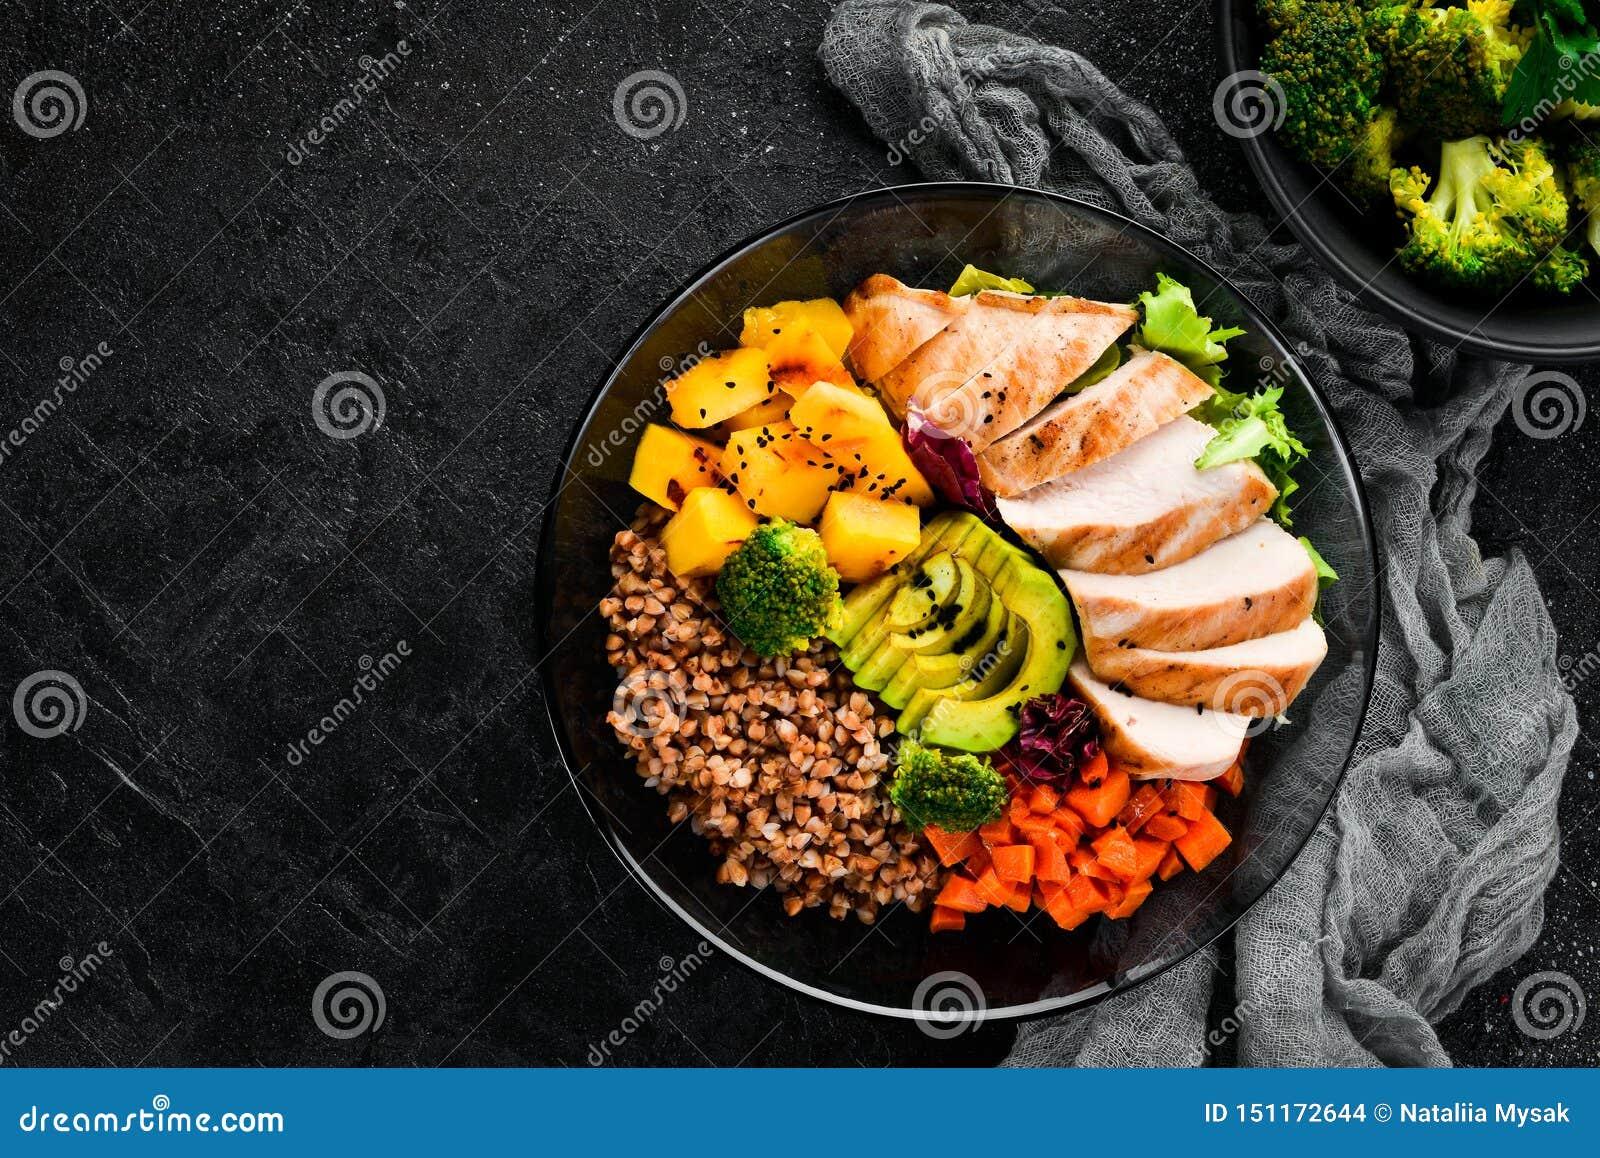 Bowl Buddha. Buckwheat, pumpkin, chicken fillet, avocado, carrots. On a black background.